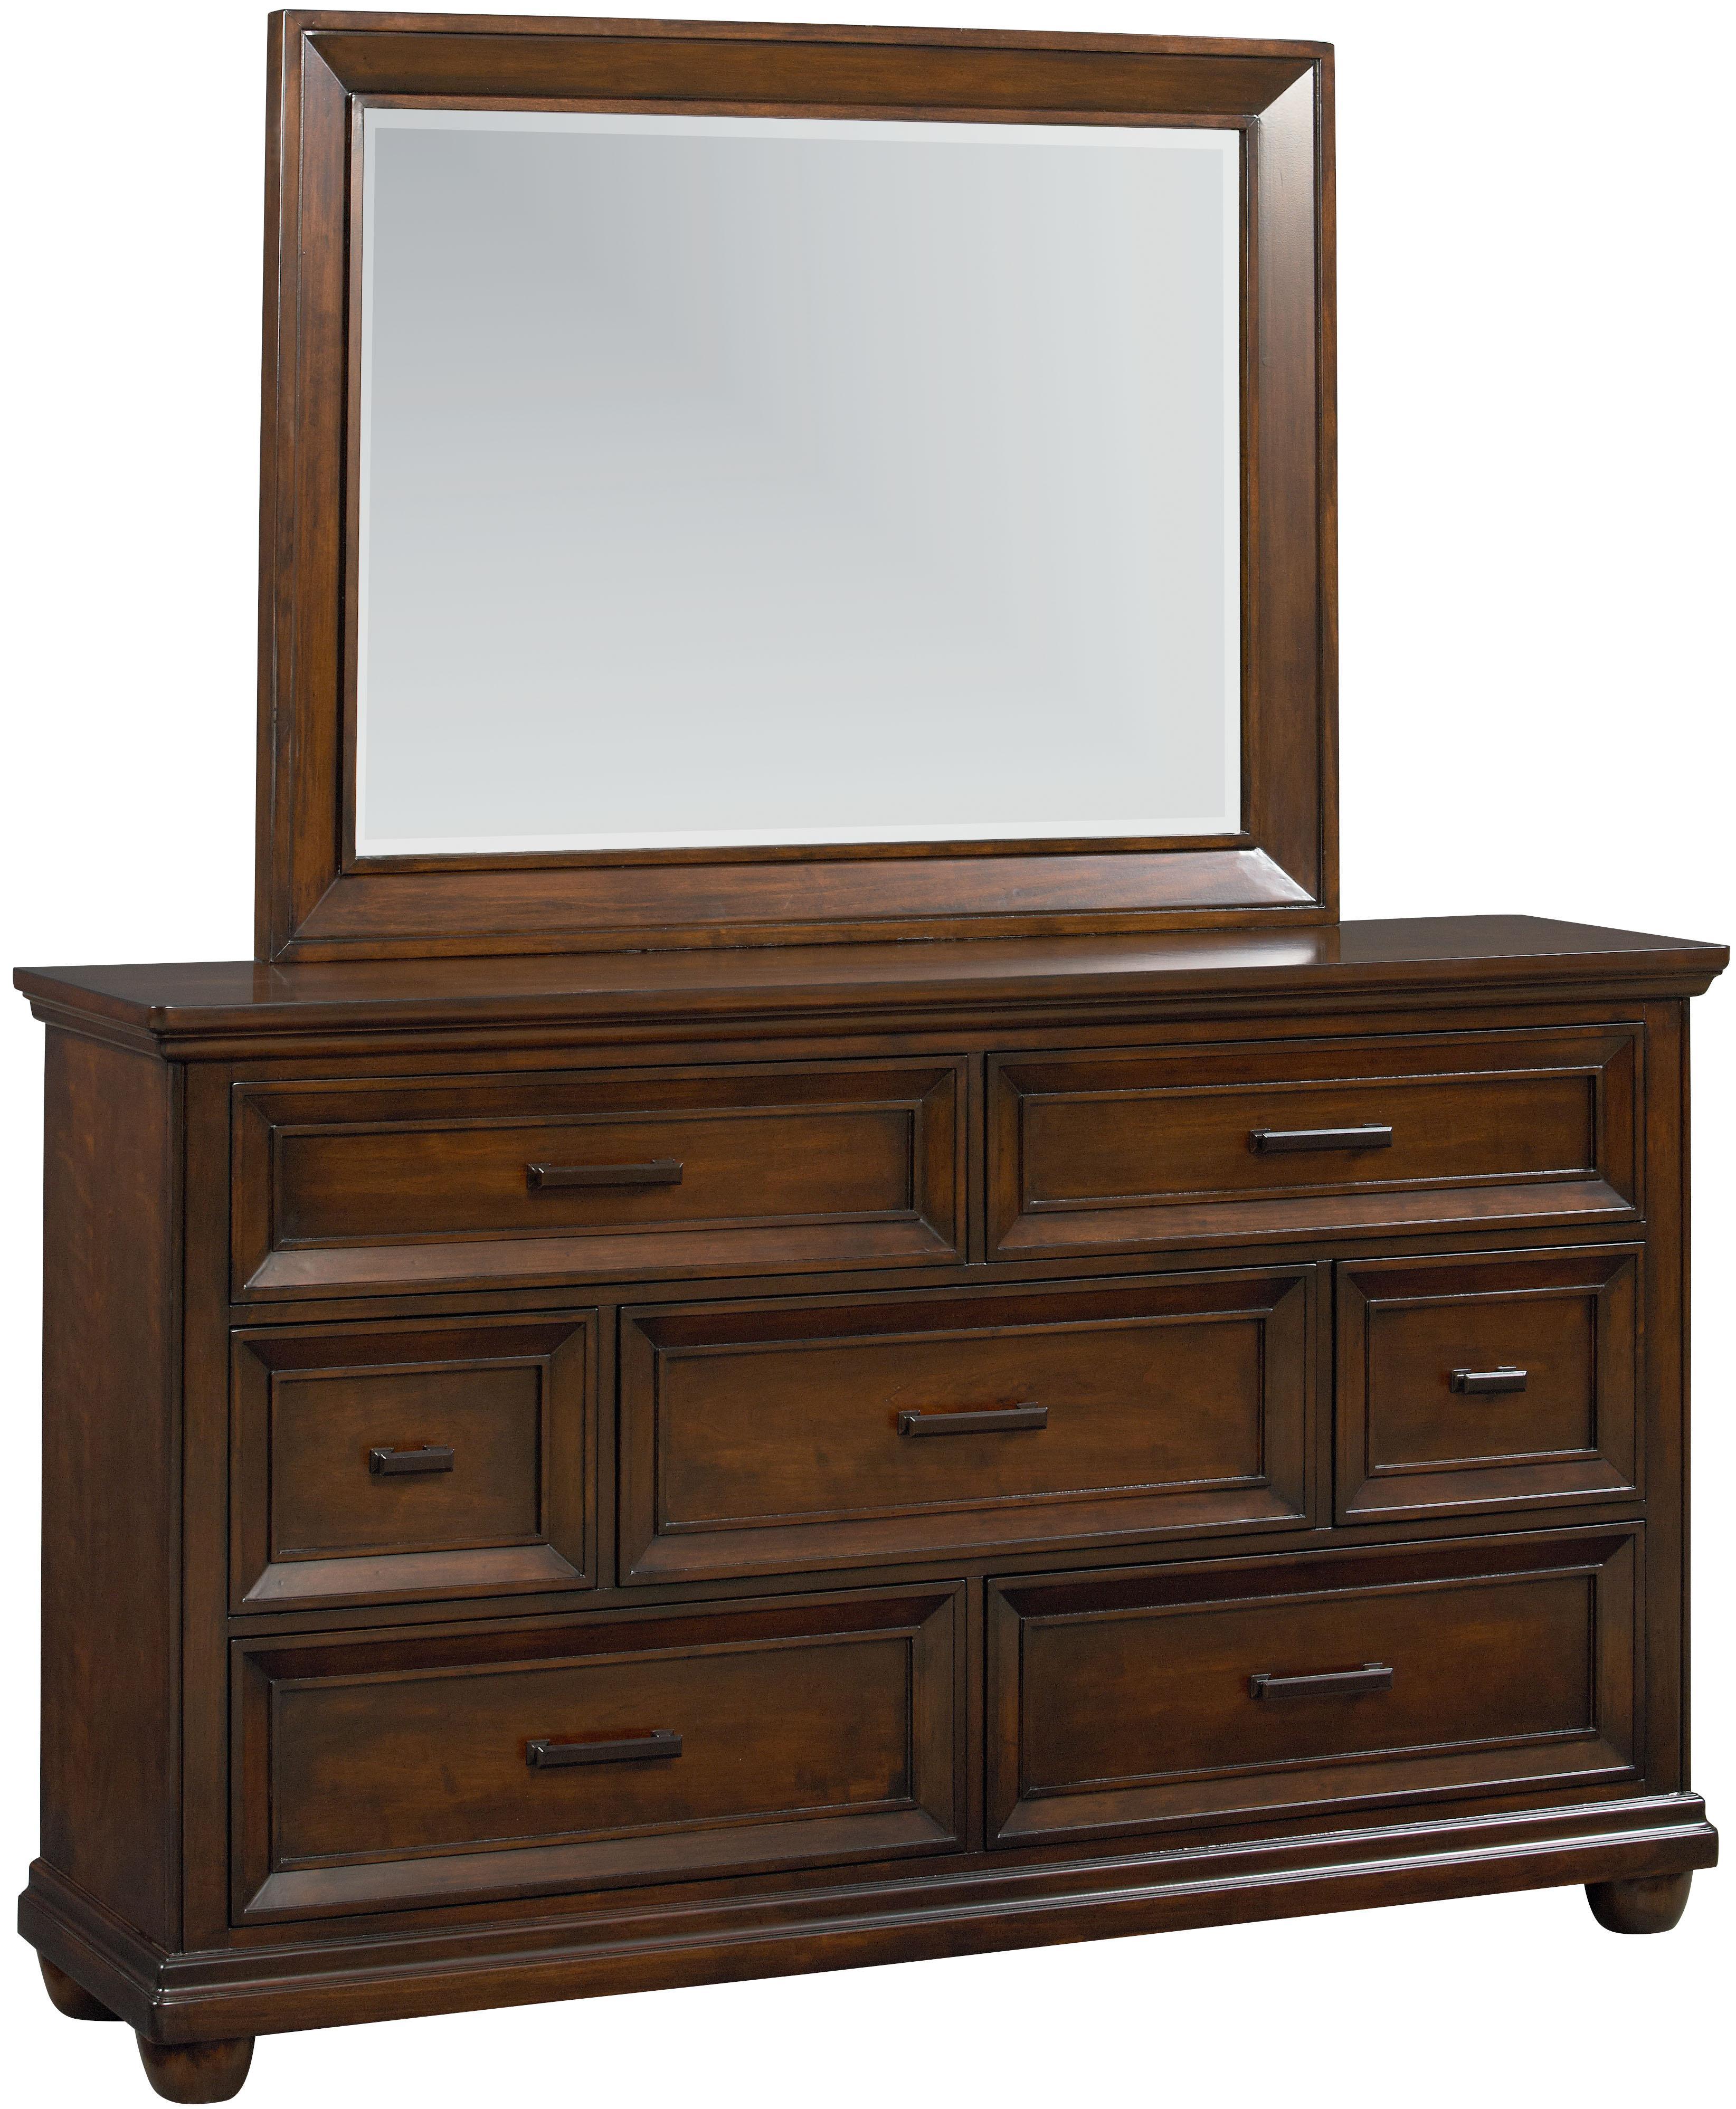 Vendor 855 Vineyard Dresser & Mirror Combo - Item Number: 87708+87709